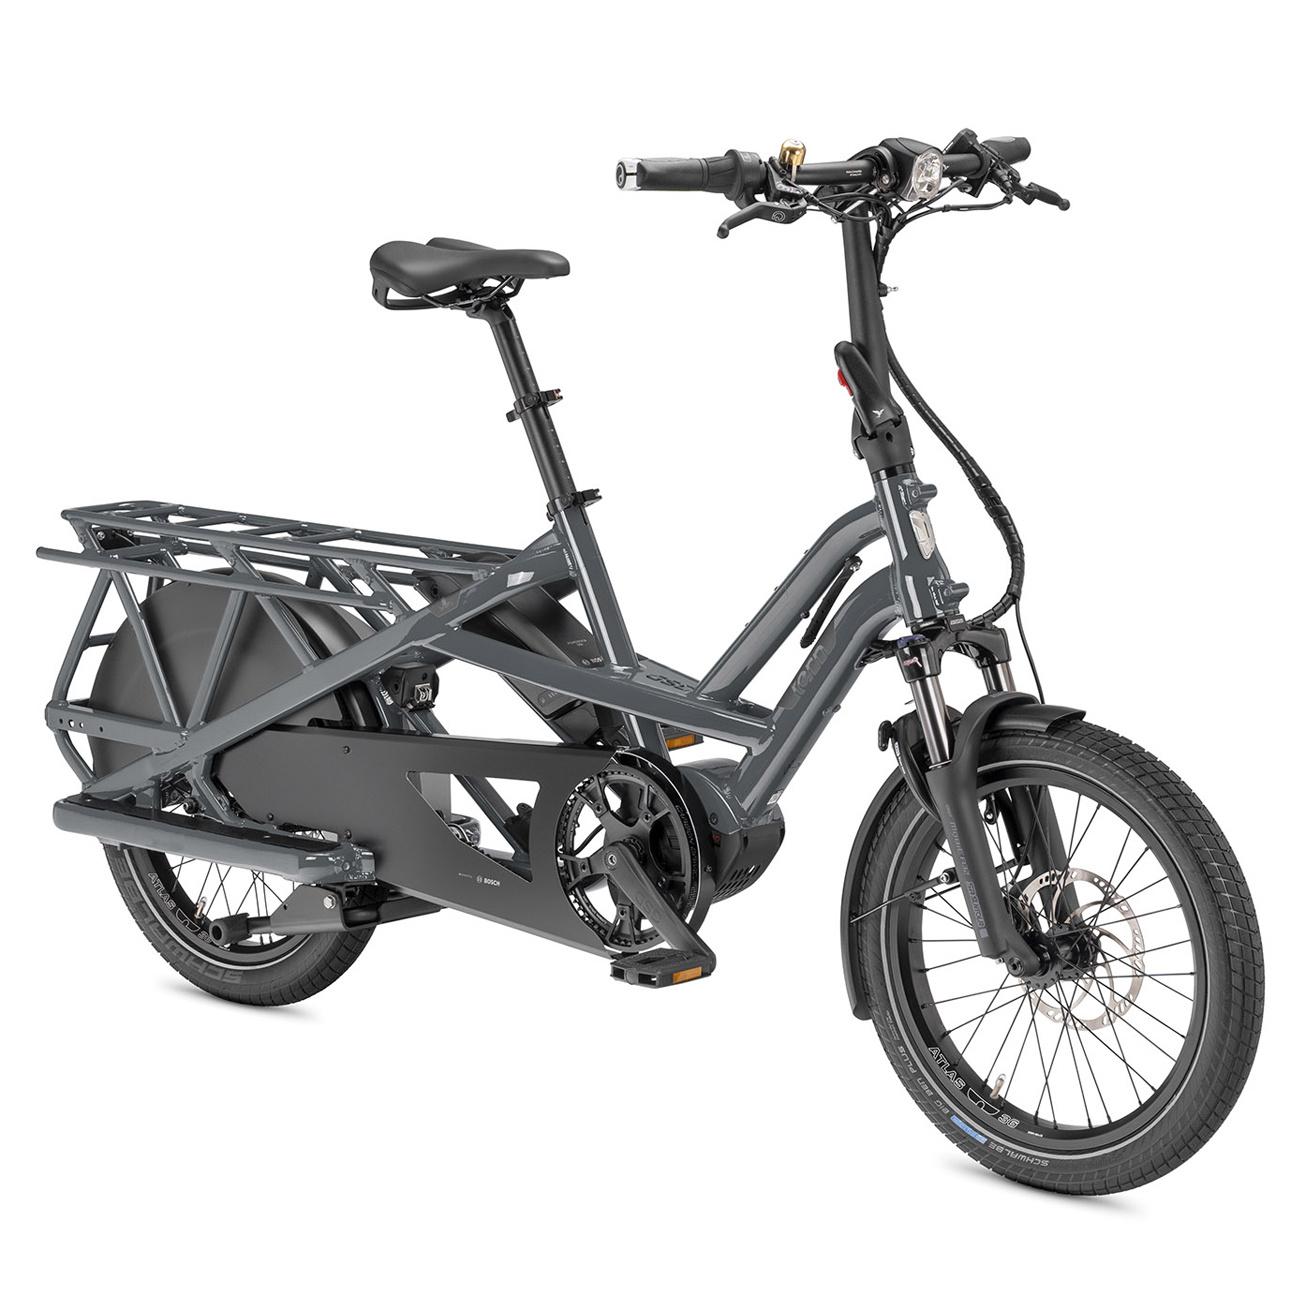 Tern GSD S00 Cargobike Modell 2021